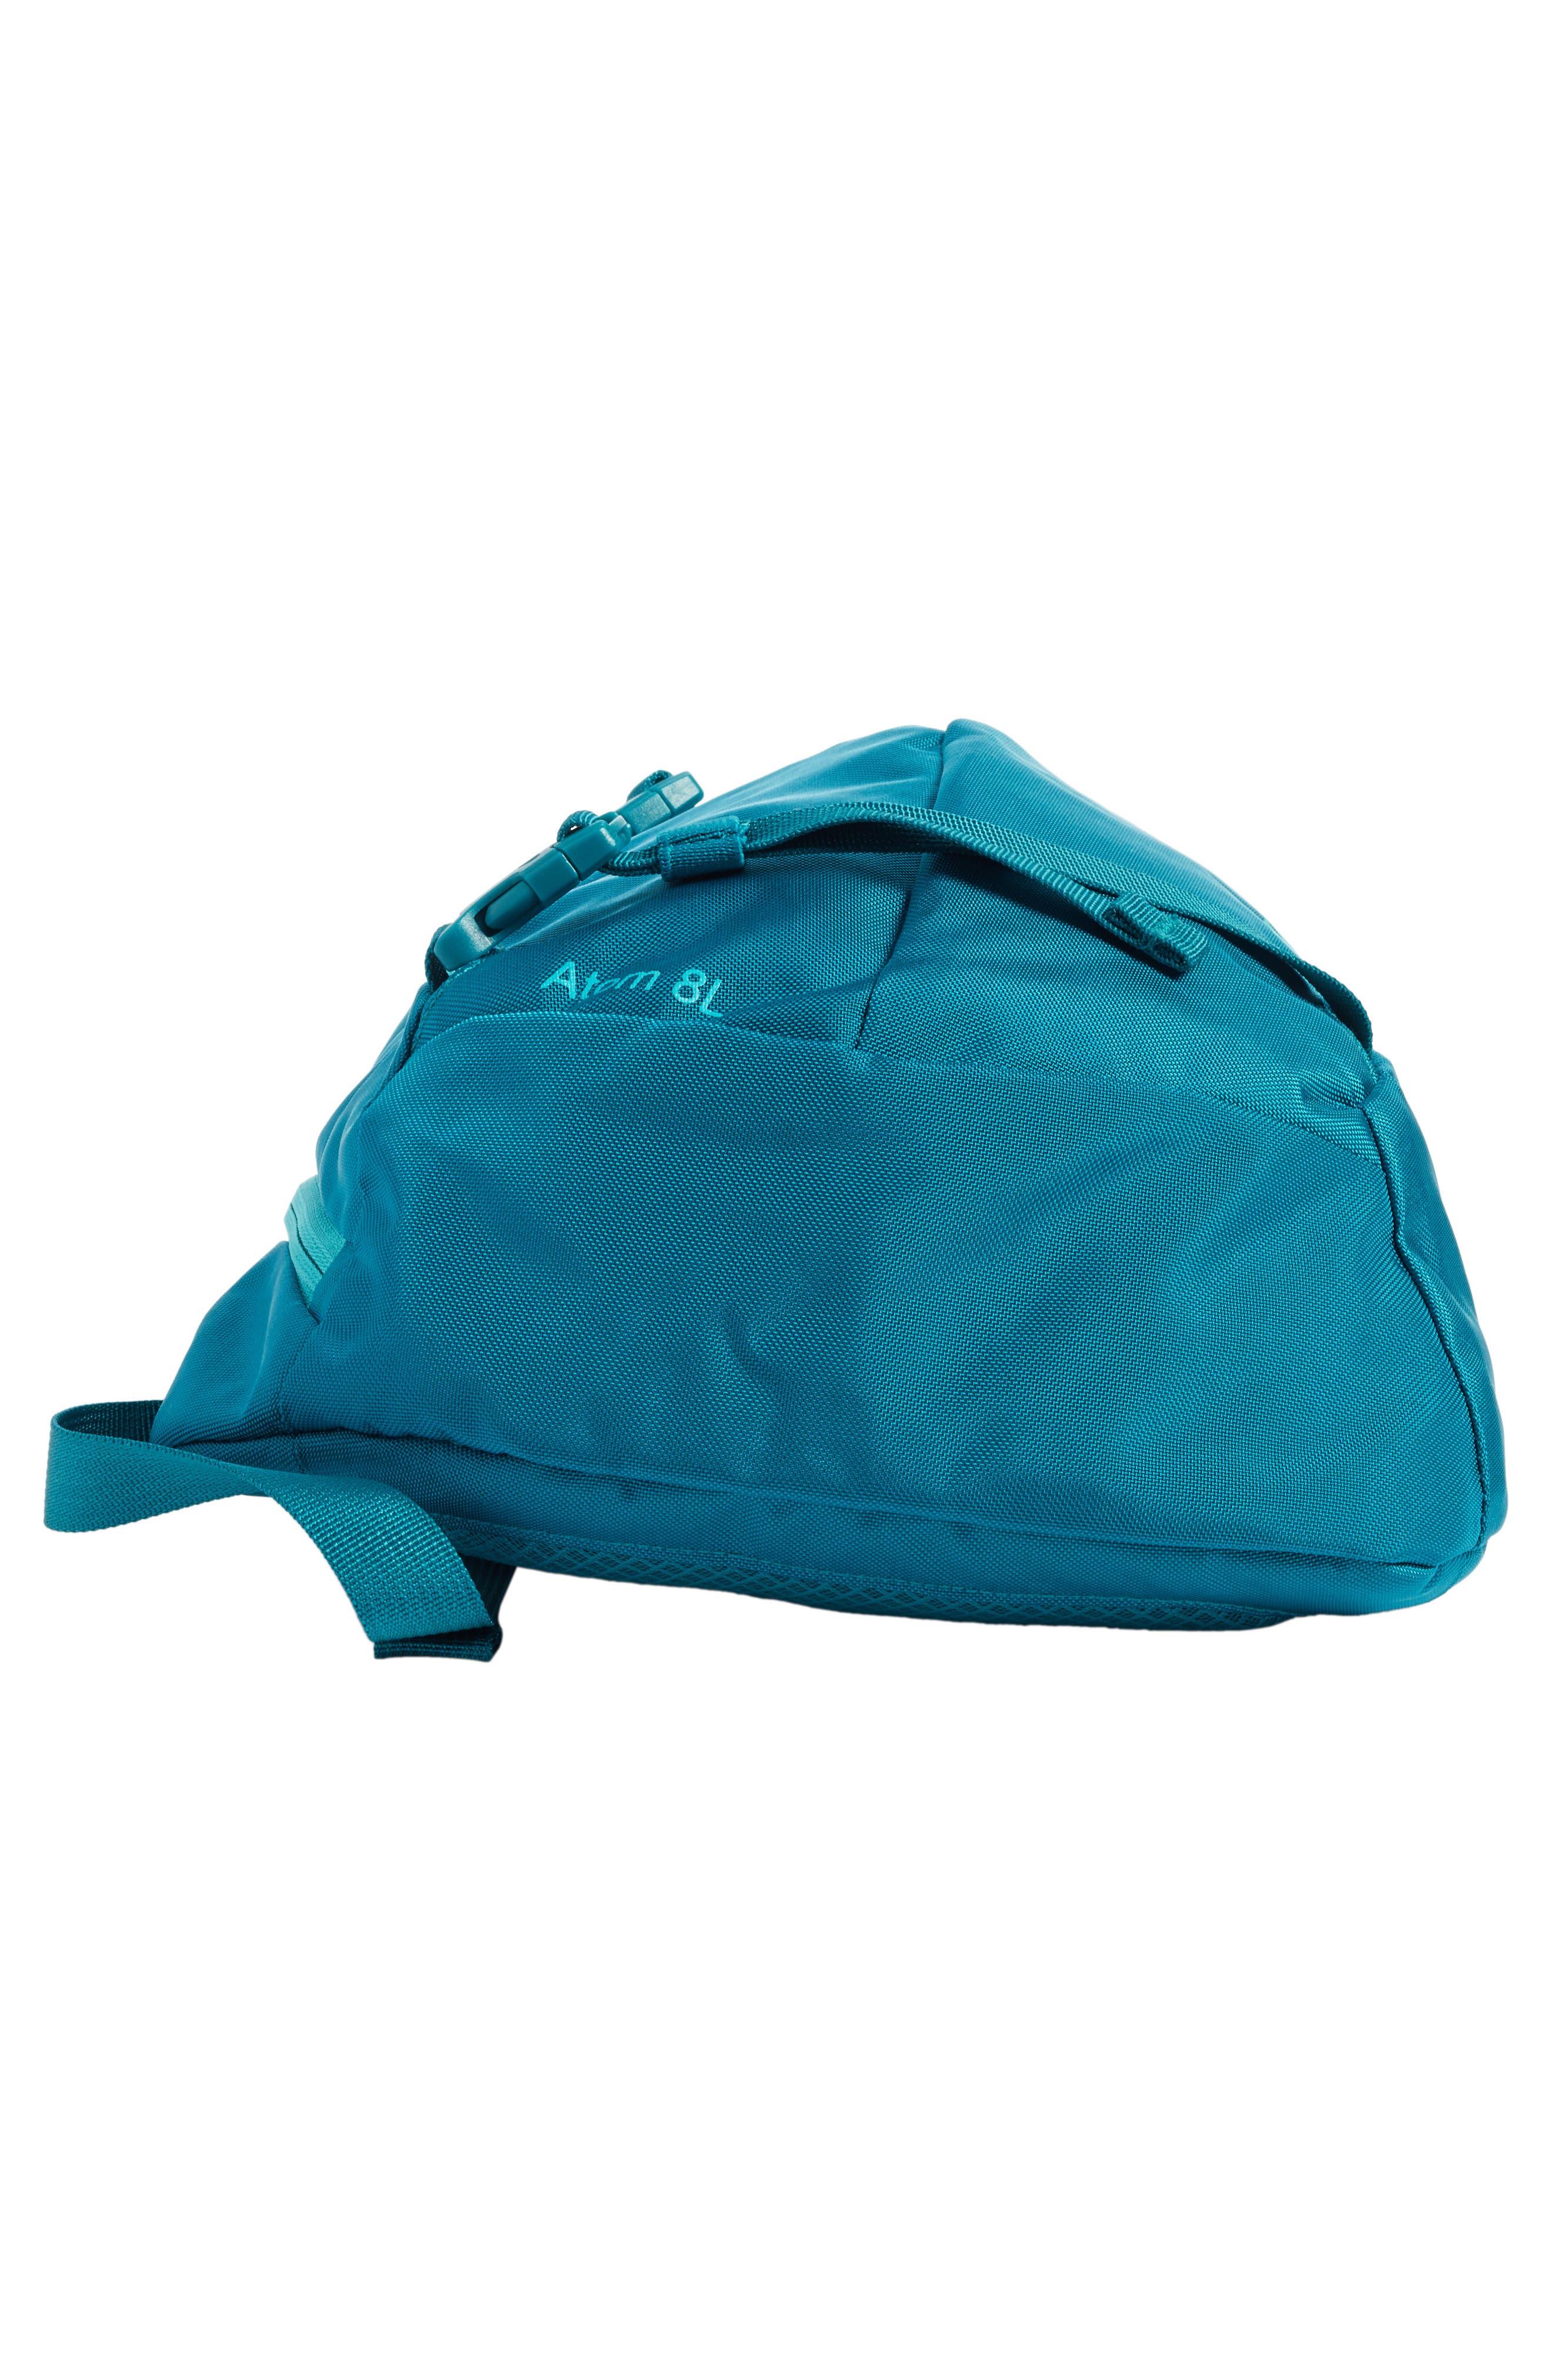 Atom 8L Sling Backpack,                             Alternate thumbnail 6, color,                             Elwha Blue